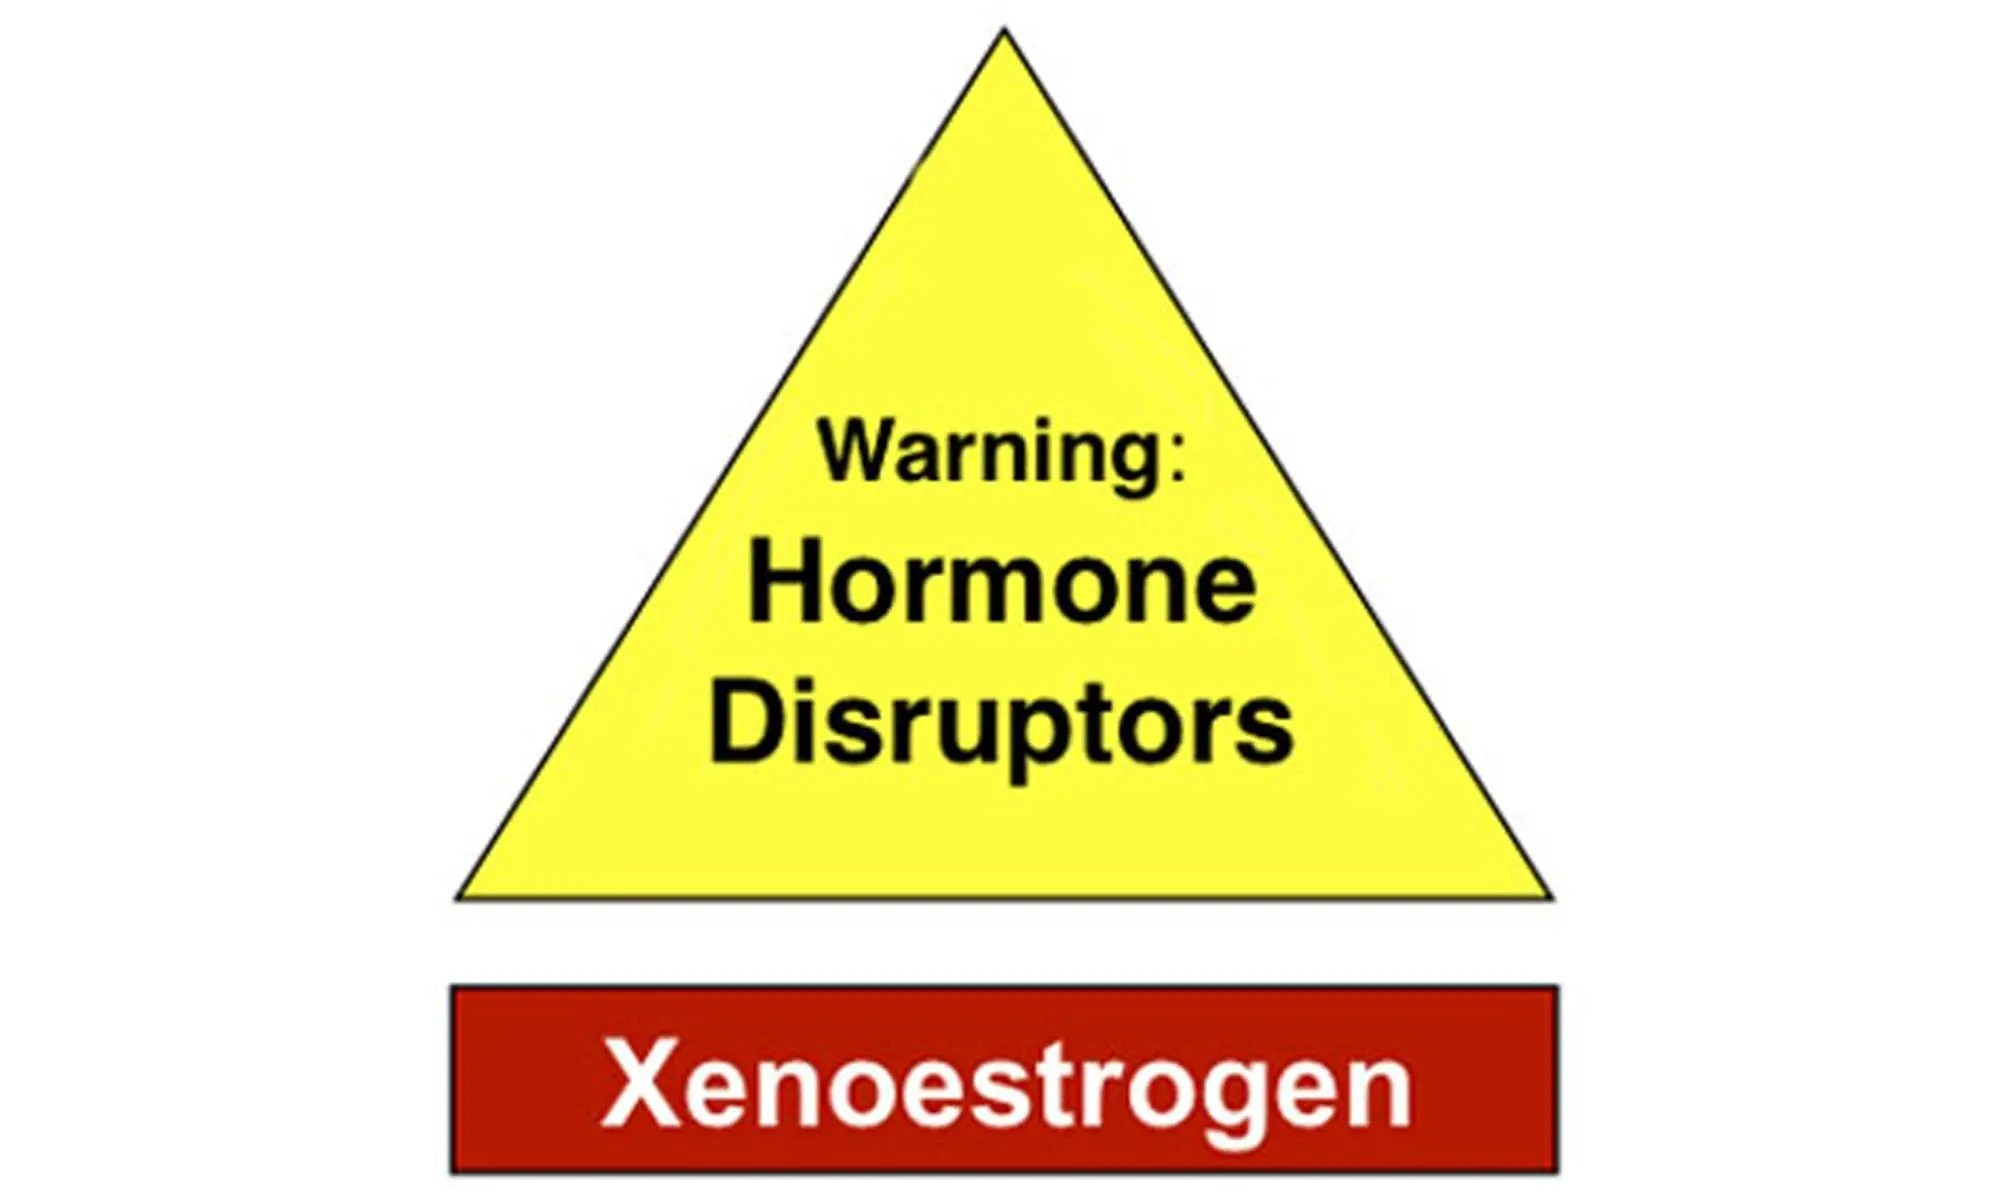 image of Xenoestrogens warning